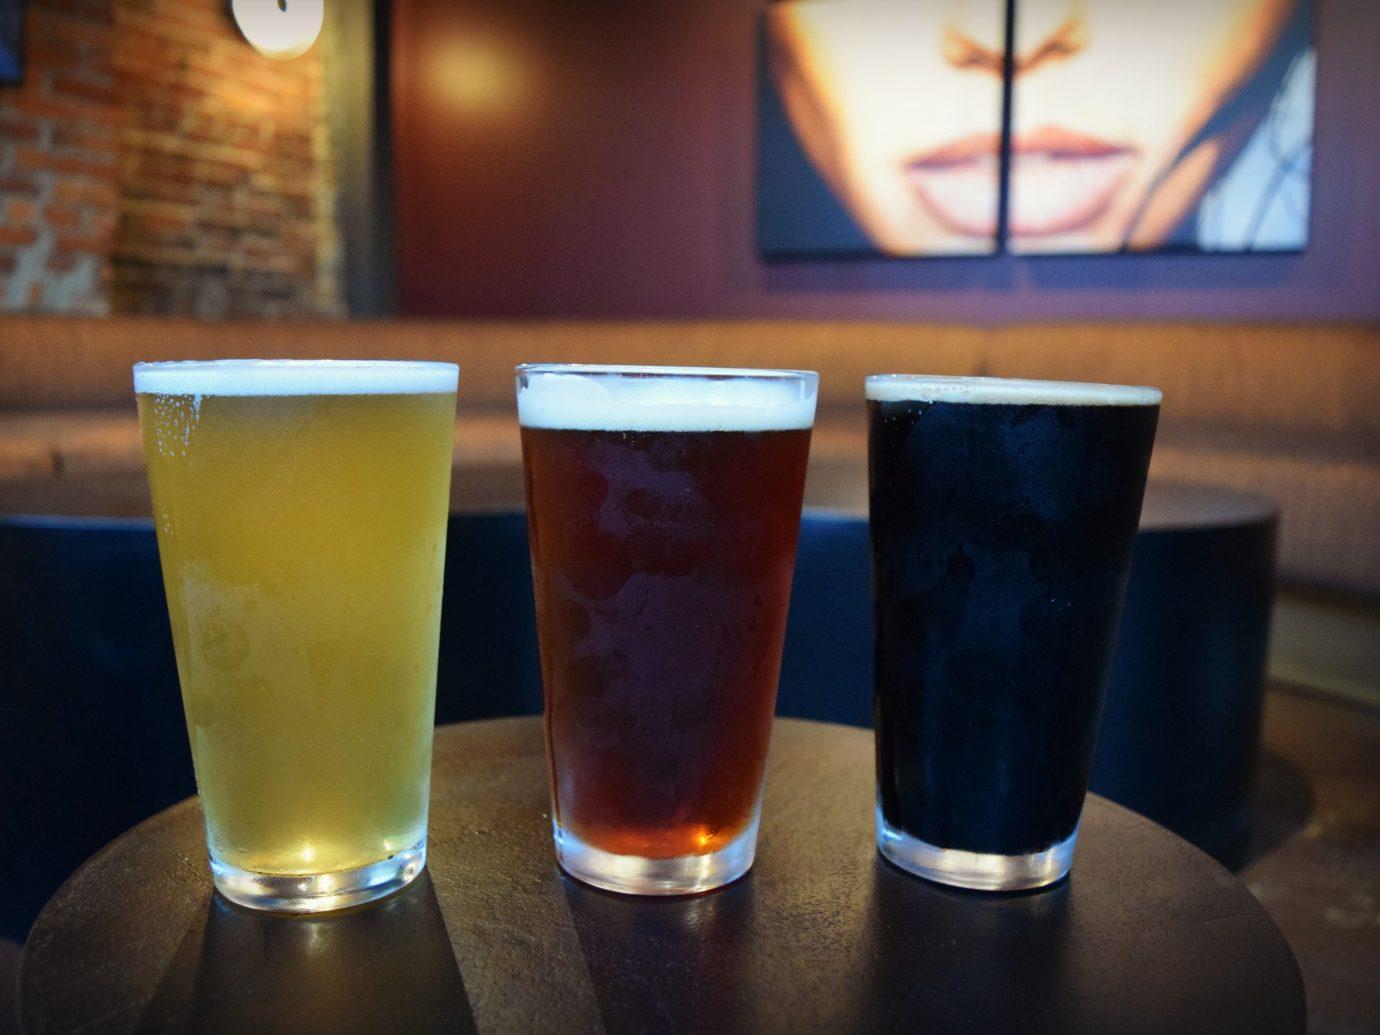 three beers on table